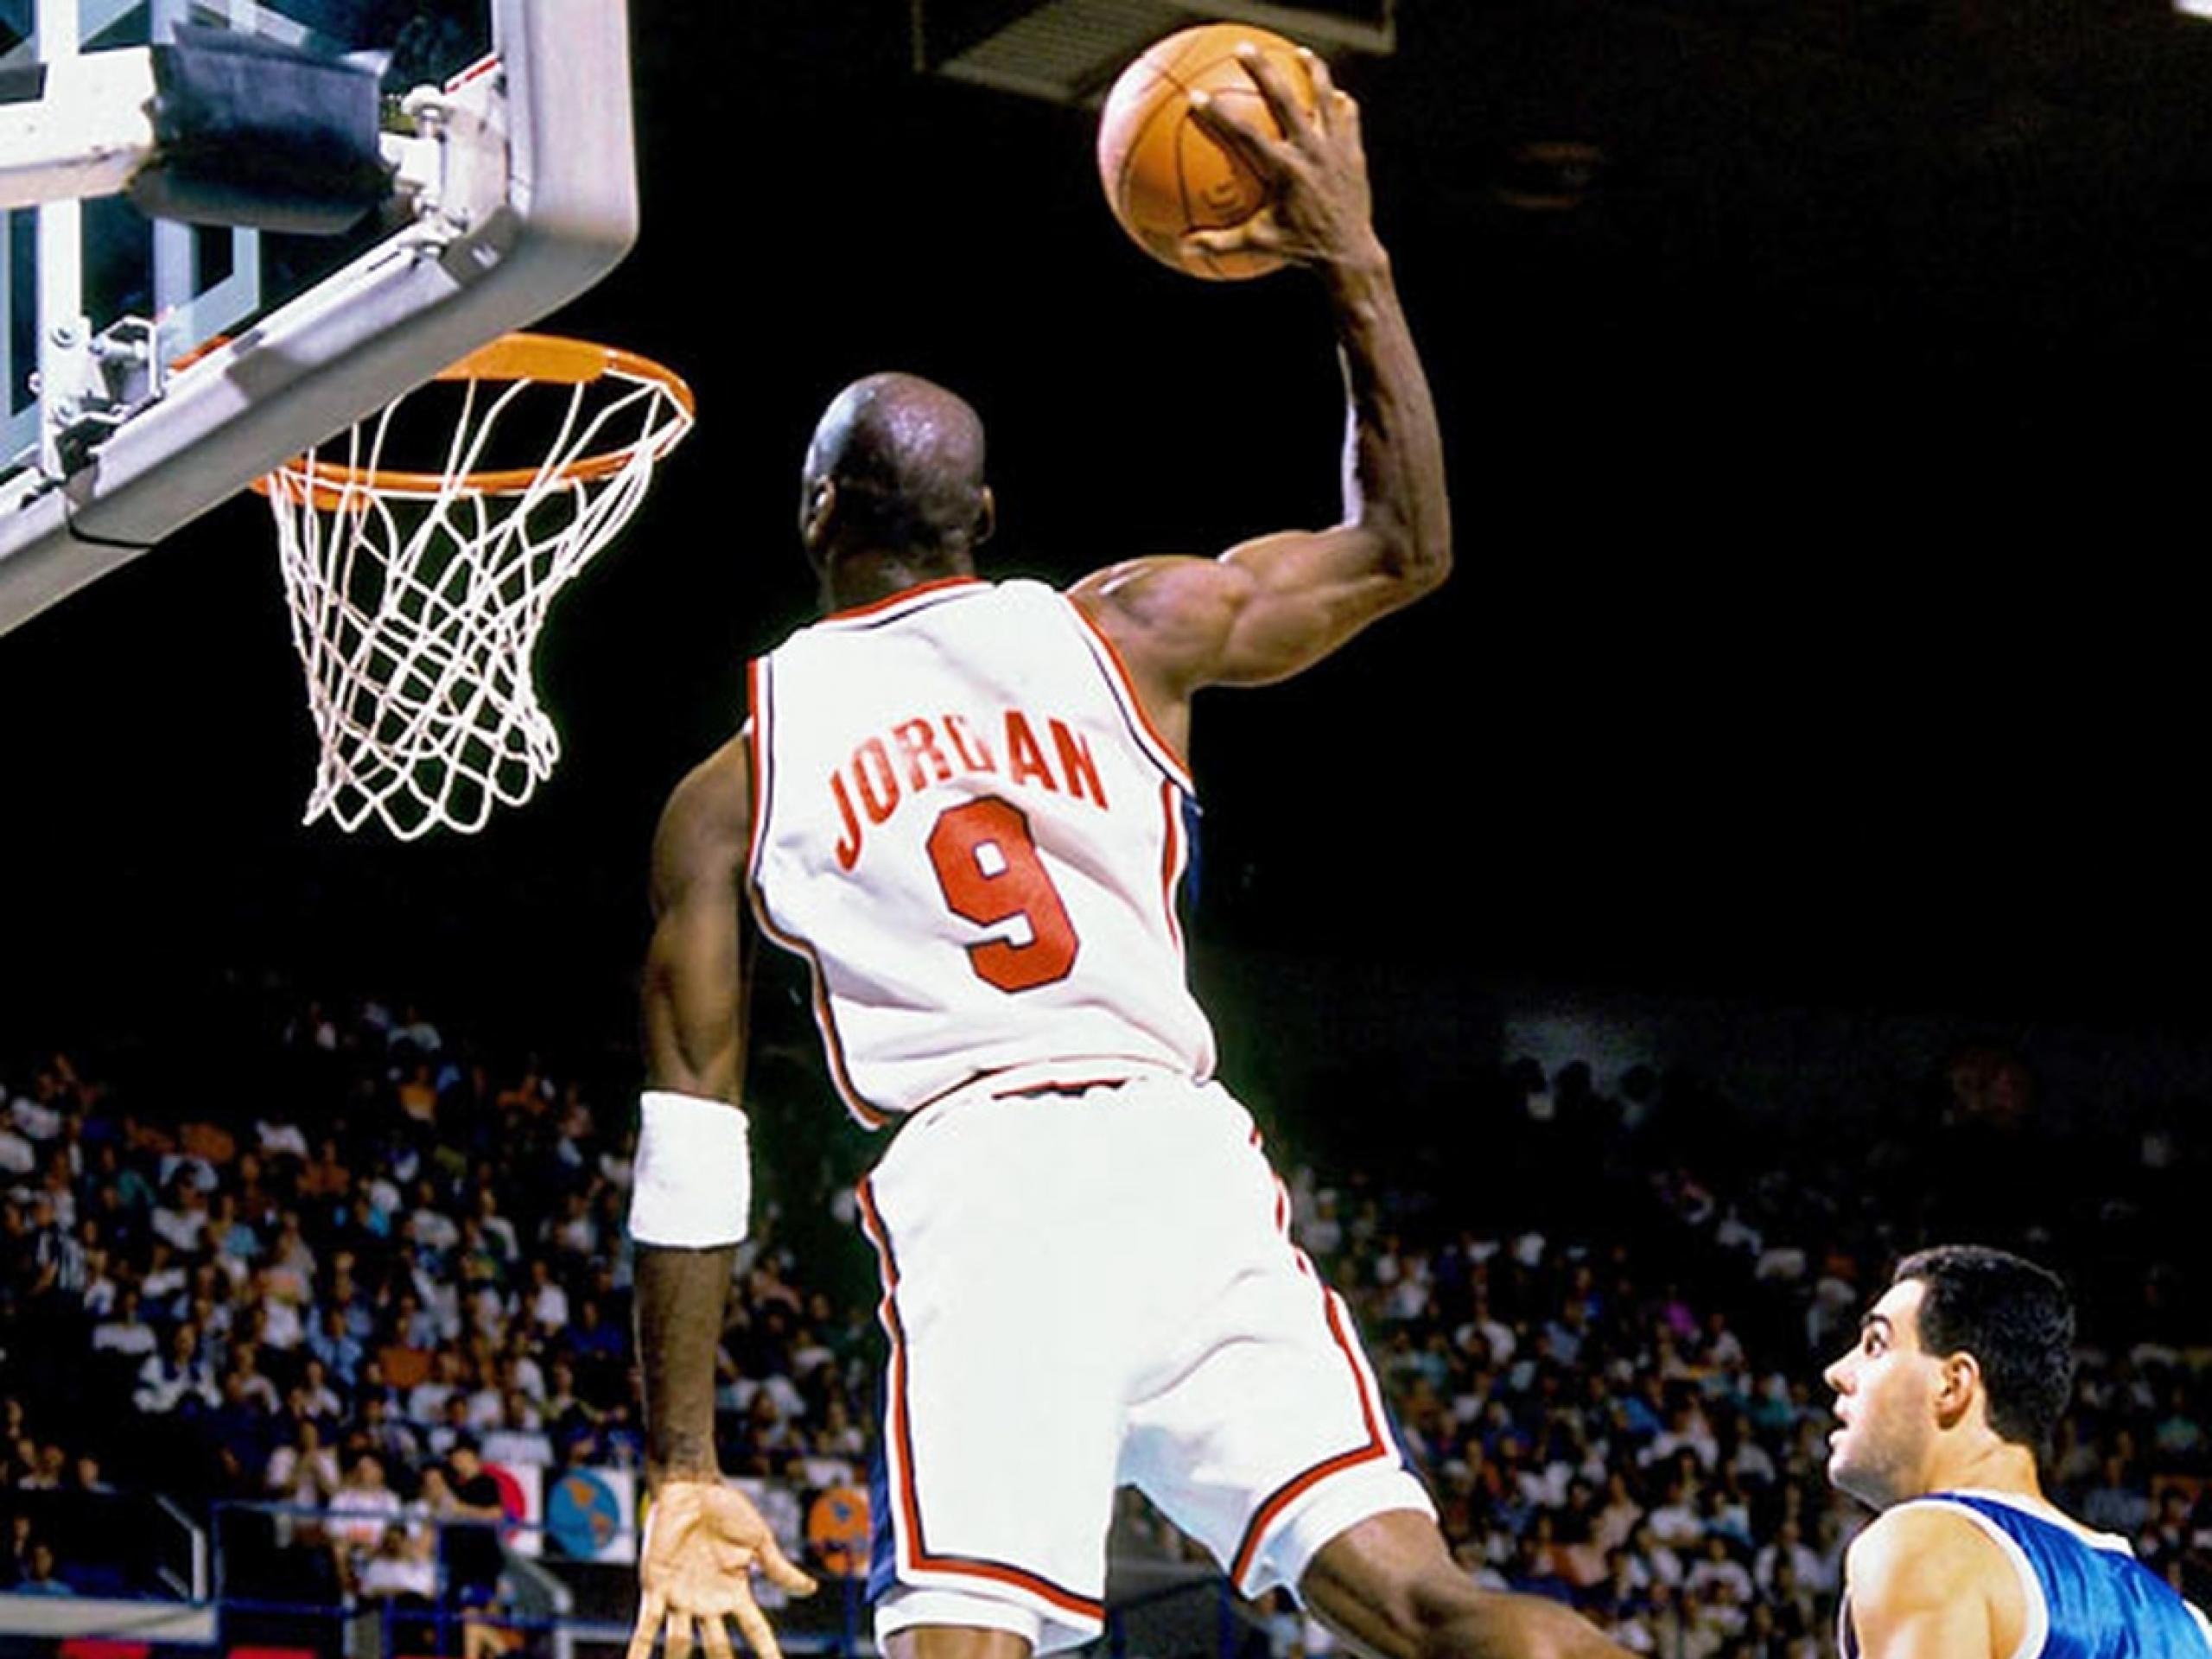 PFTW: Michael Jordan Wallpaper